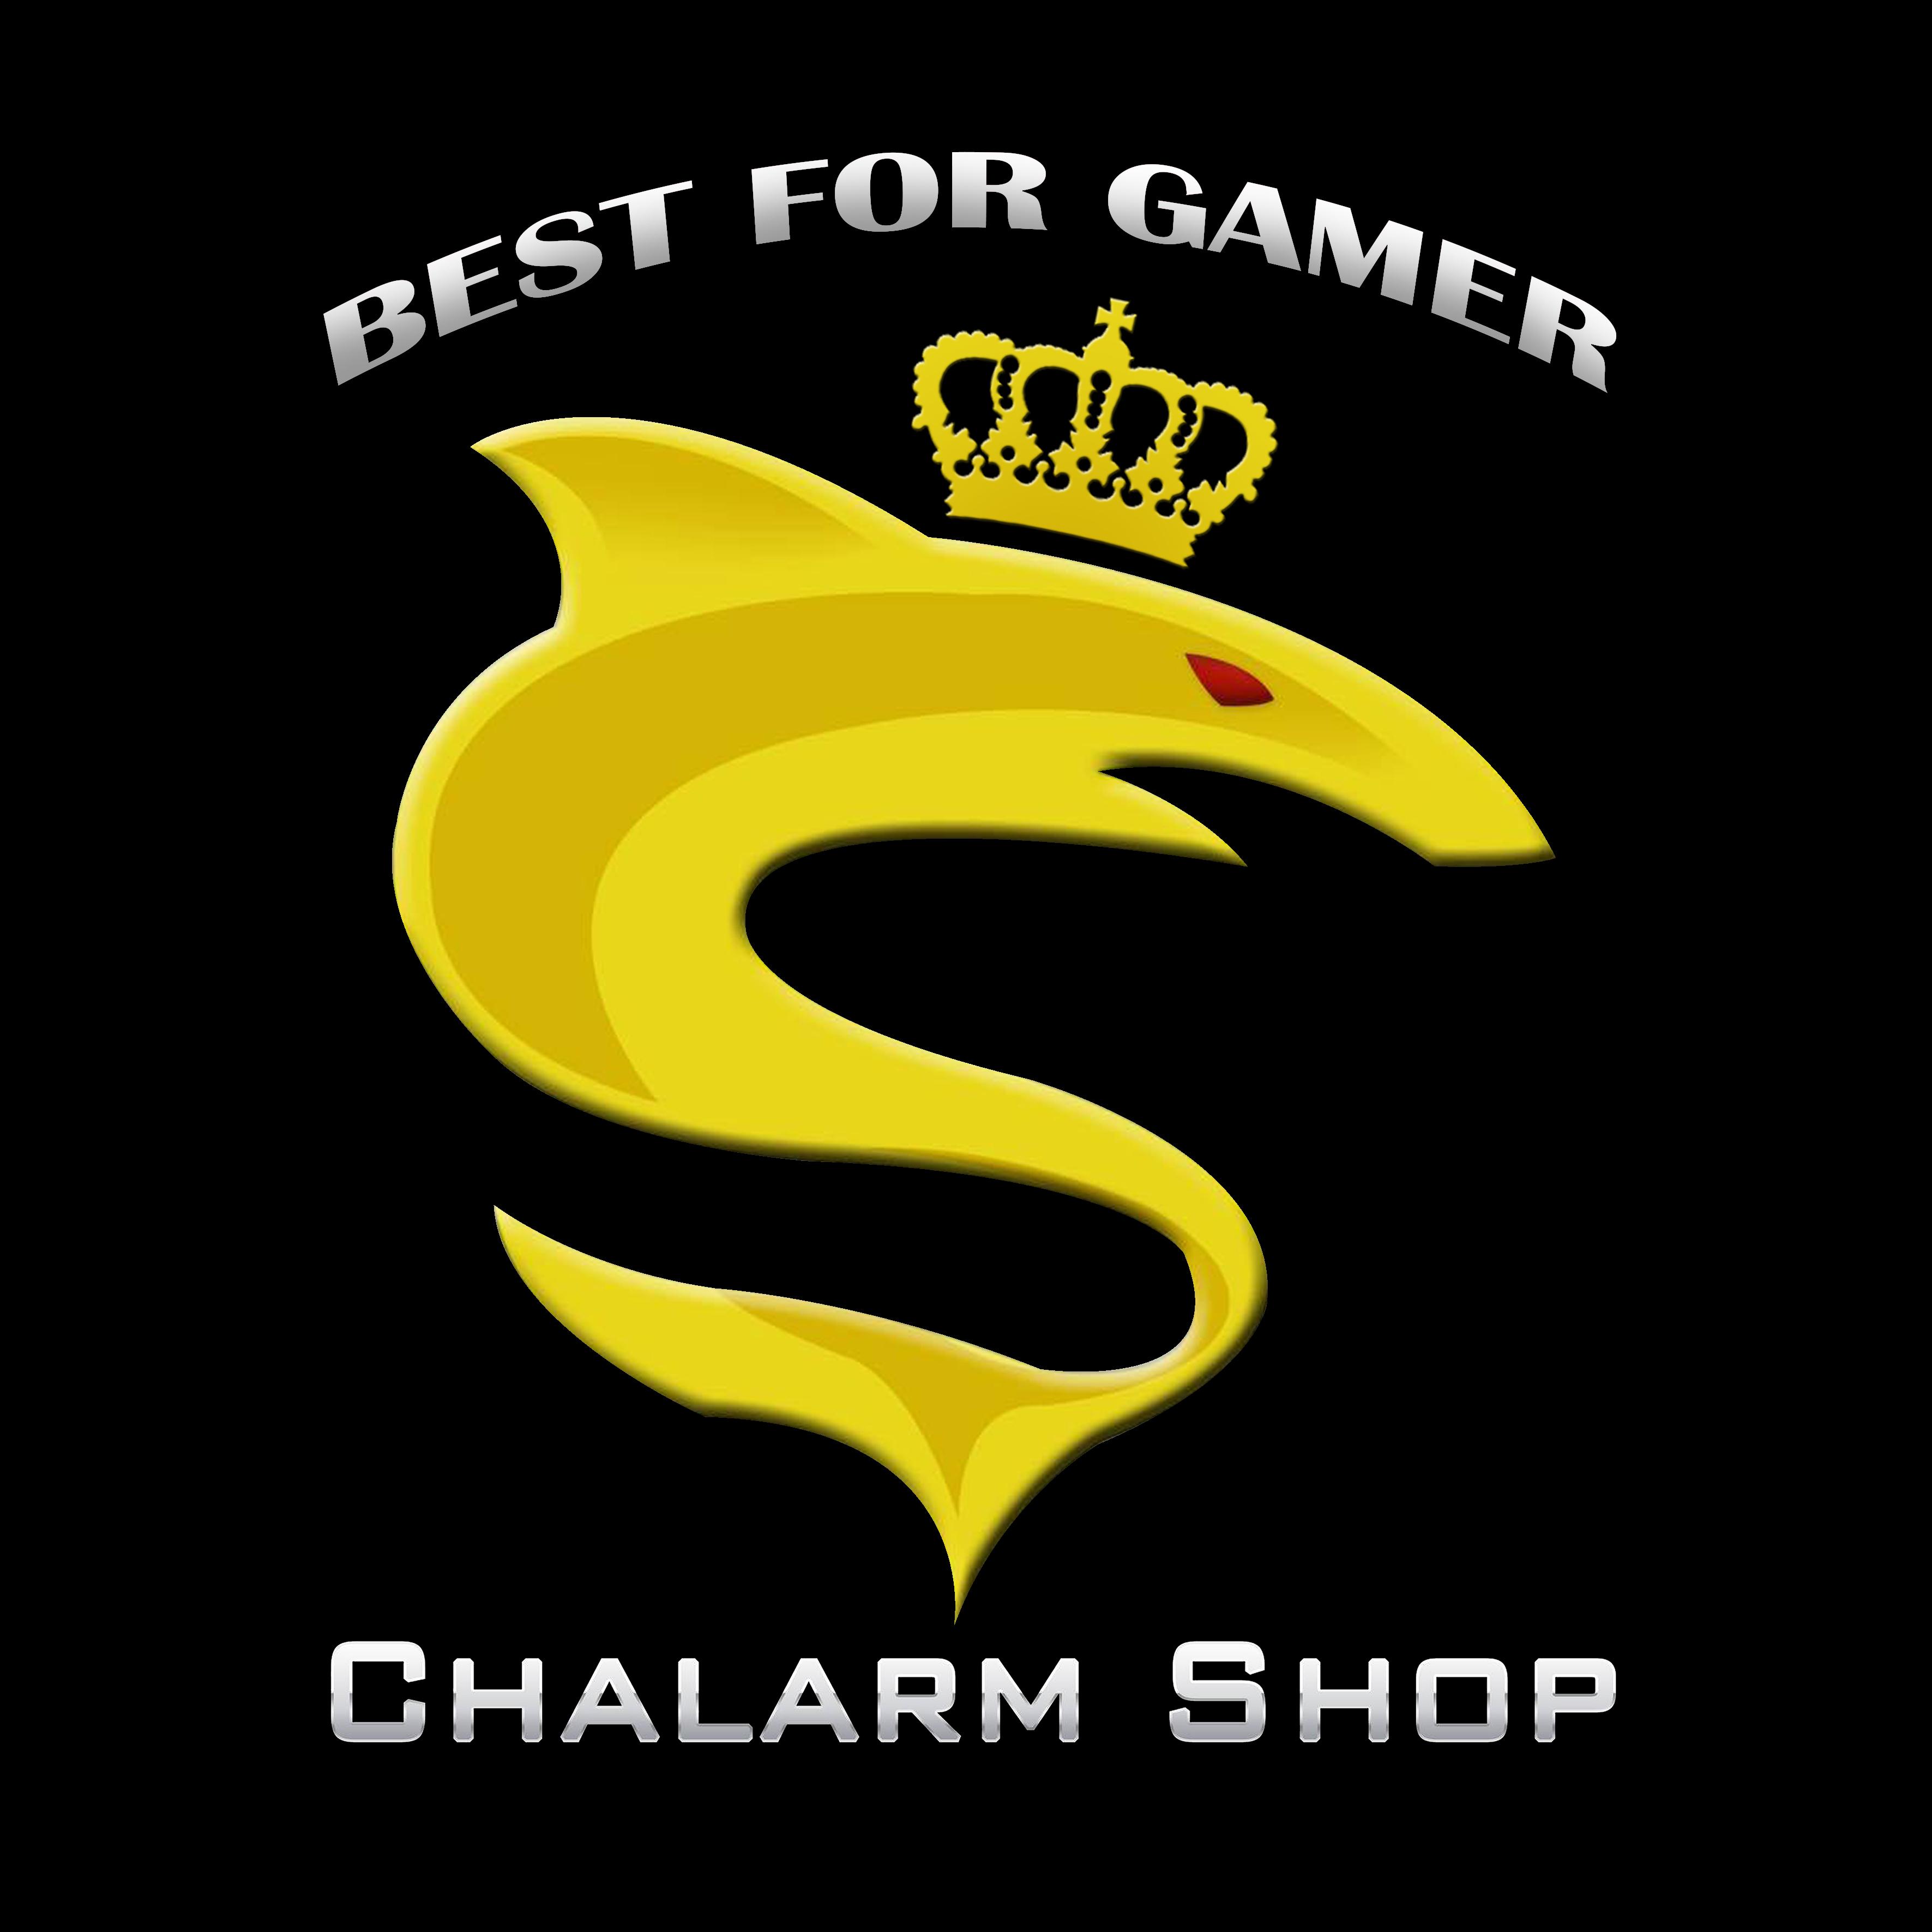 Chalarm Shop